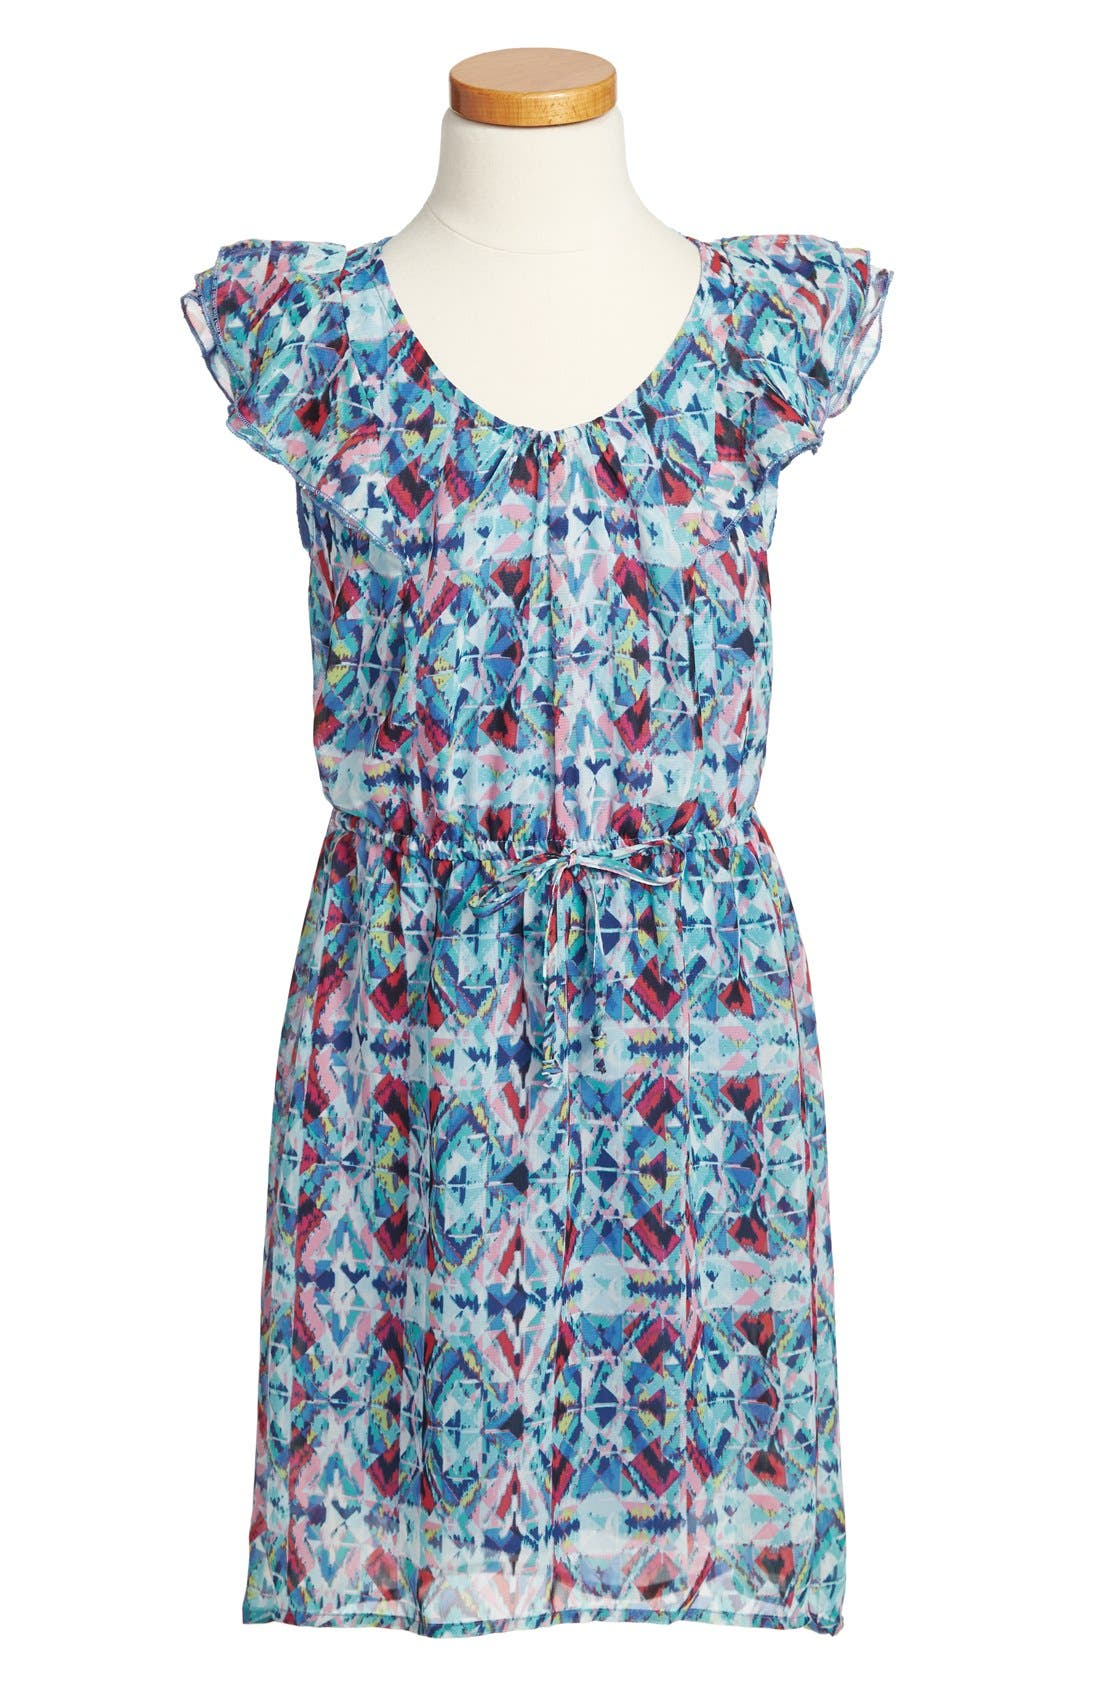 Alternate Image 1 Selected - Fishbowl Sleeveless High/Low Dress (Big Girls)